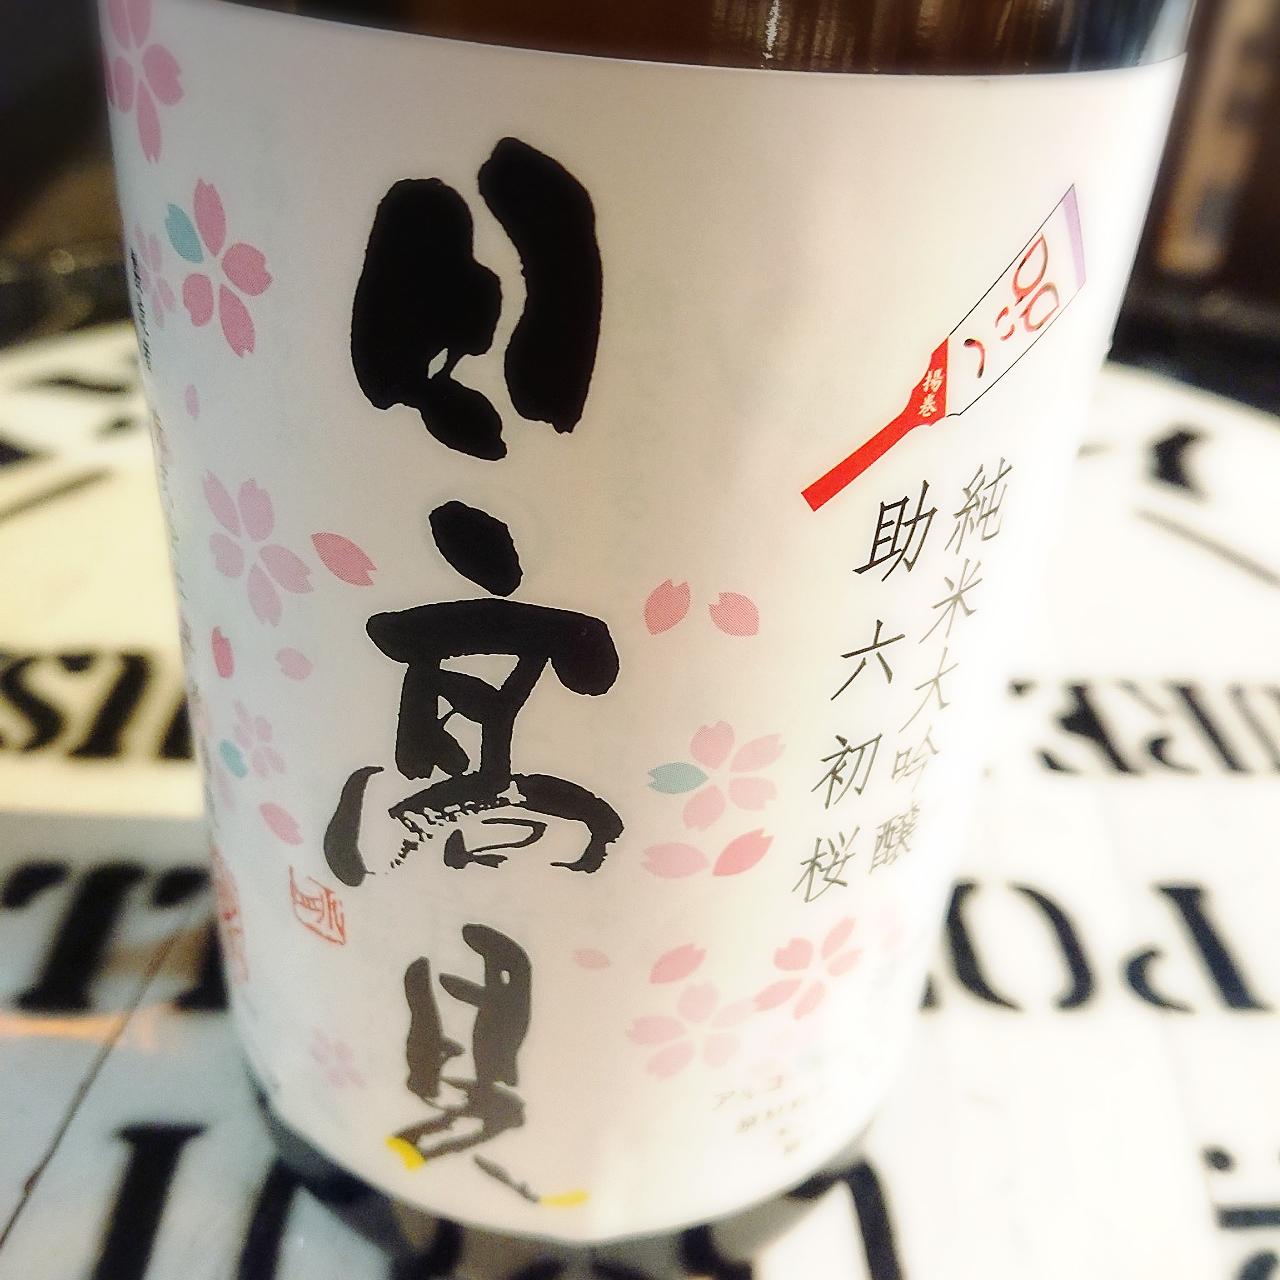 【特約店限定品】日高見 助六初桜 純米大吟醸~助六ロンドで桜舞う~